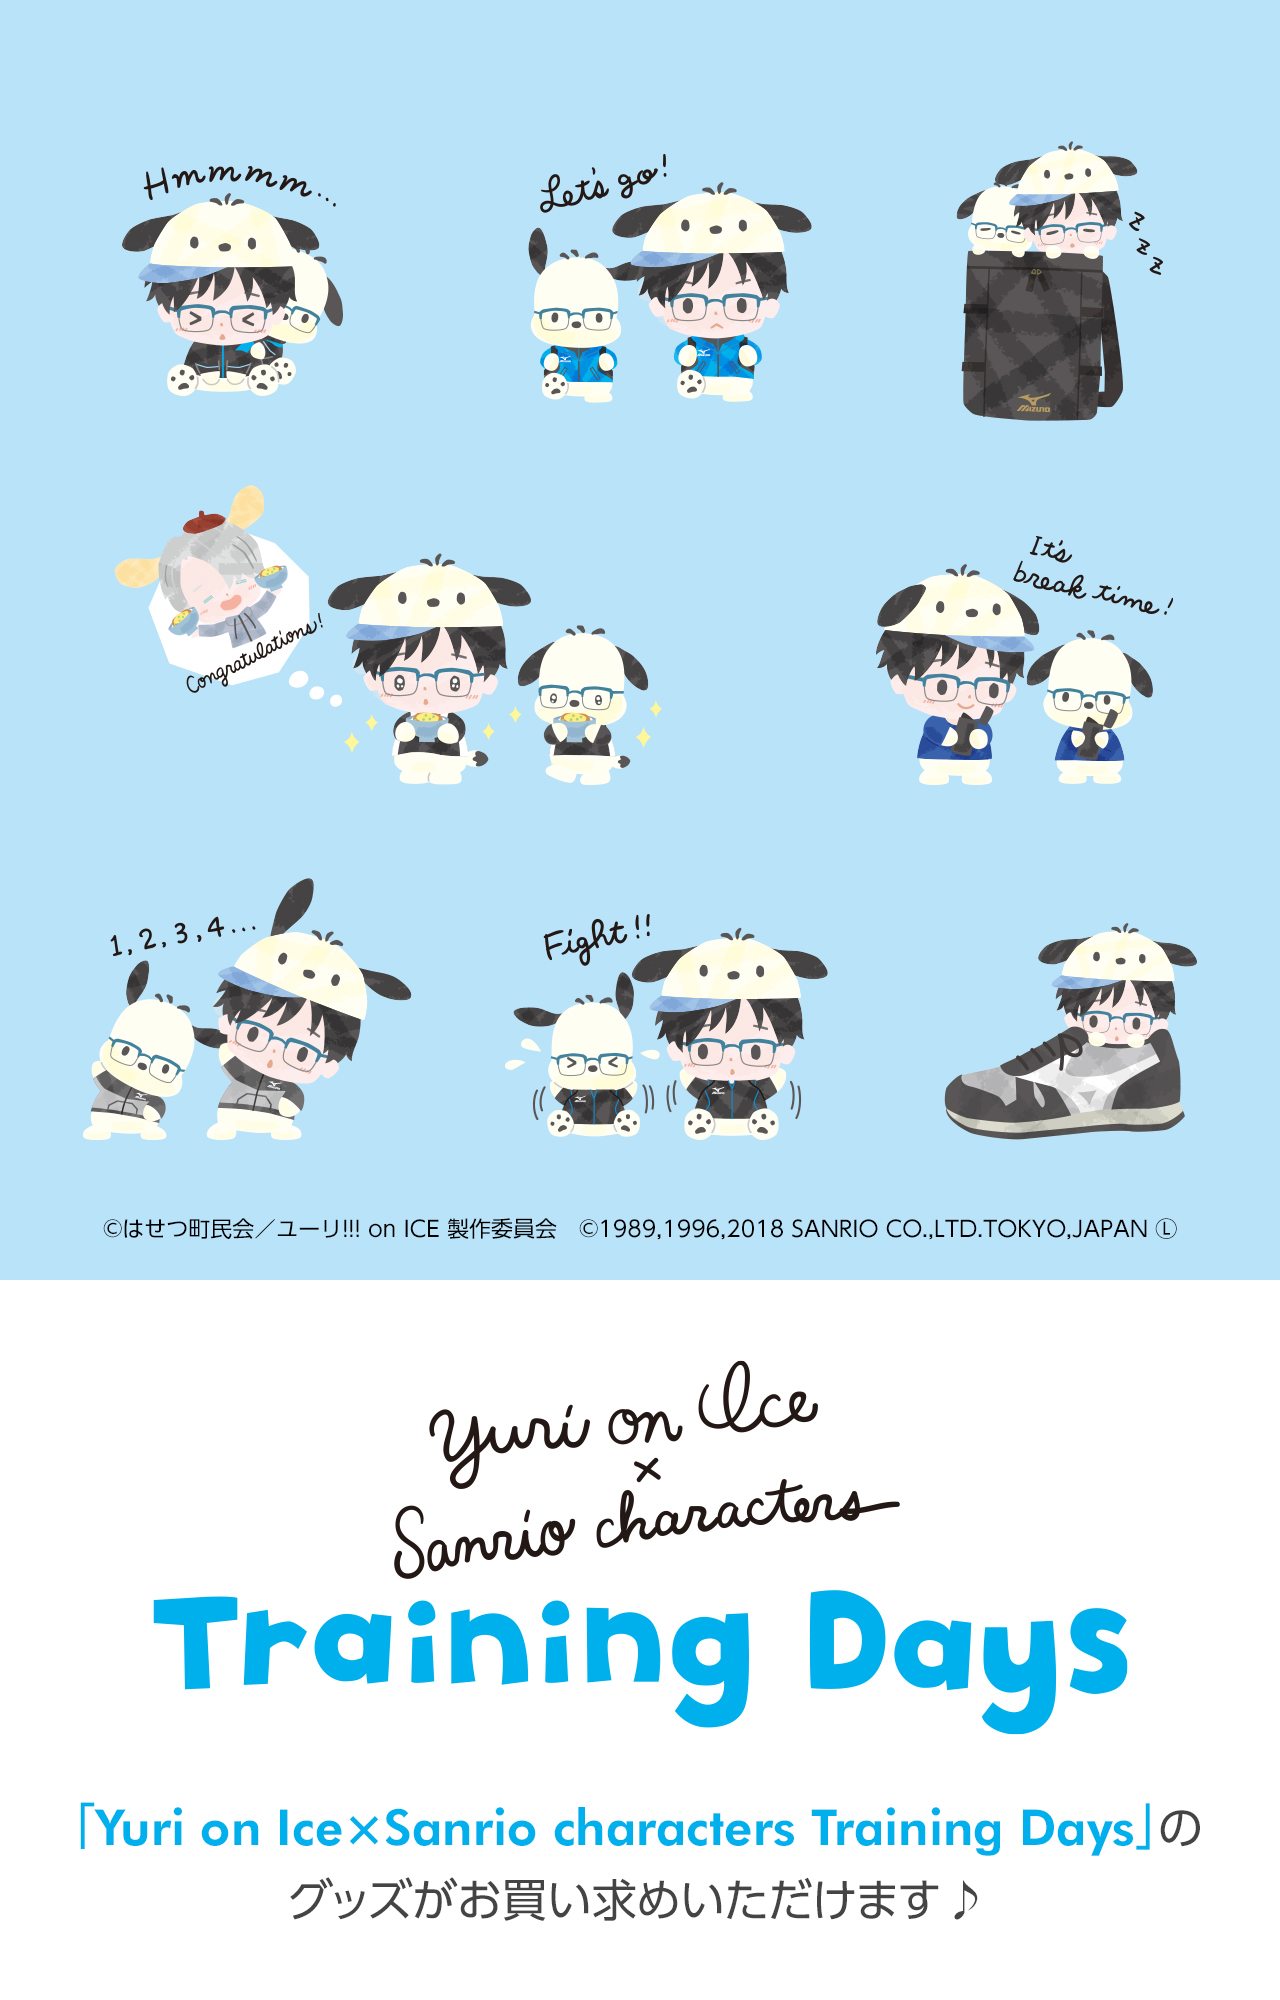 Yuri on Ice×Sanrio characters Training Days